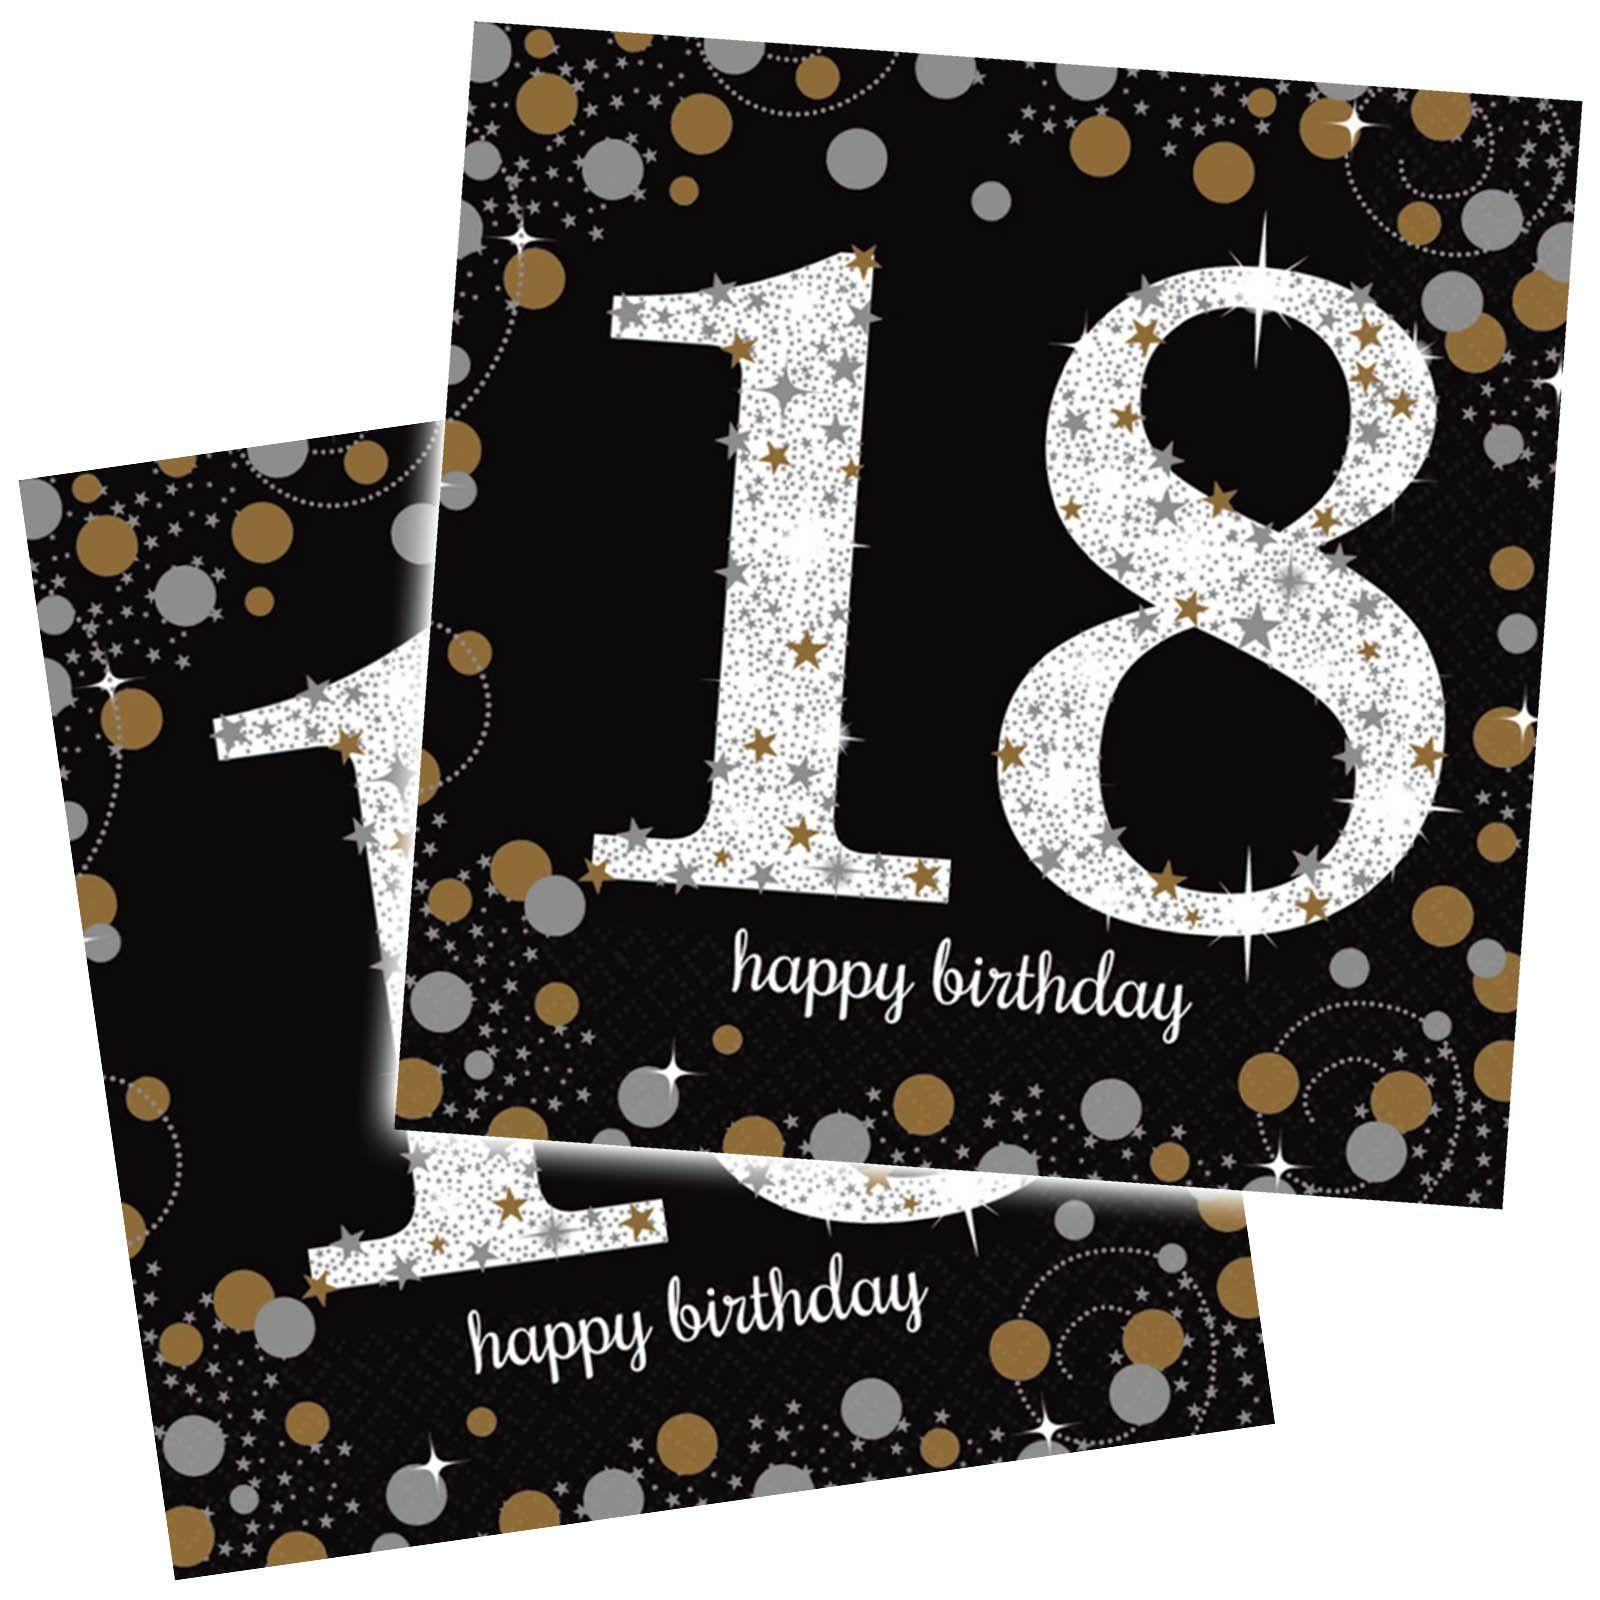 16 Gold Black Sparkle Celebration 18Th Birthday Party